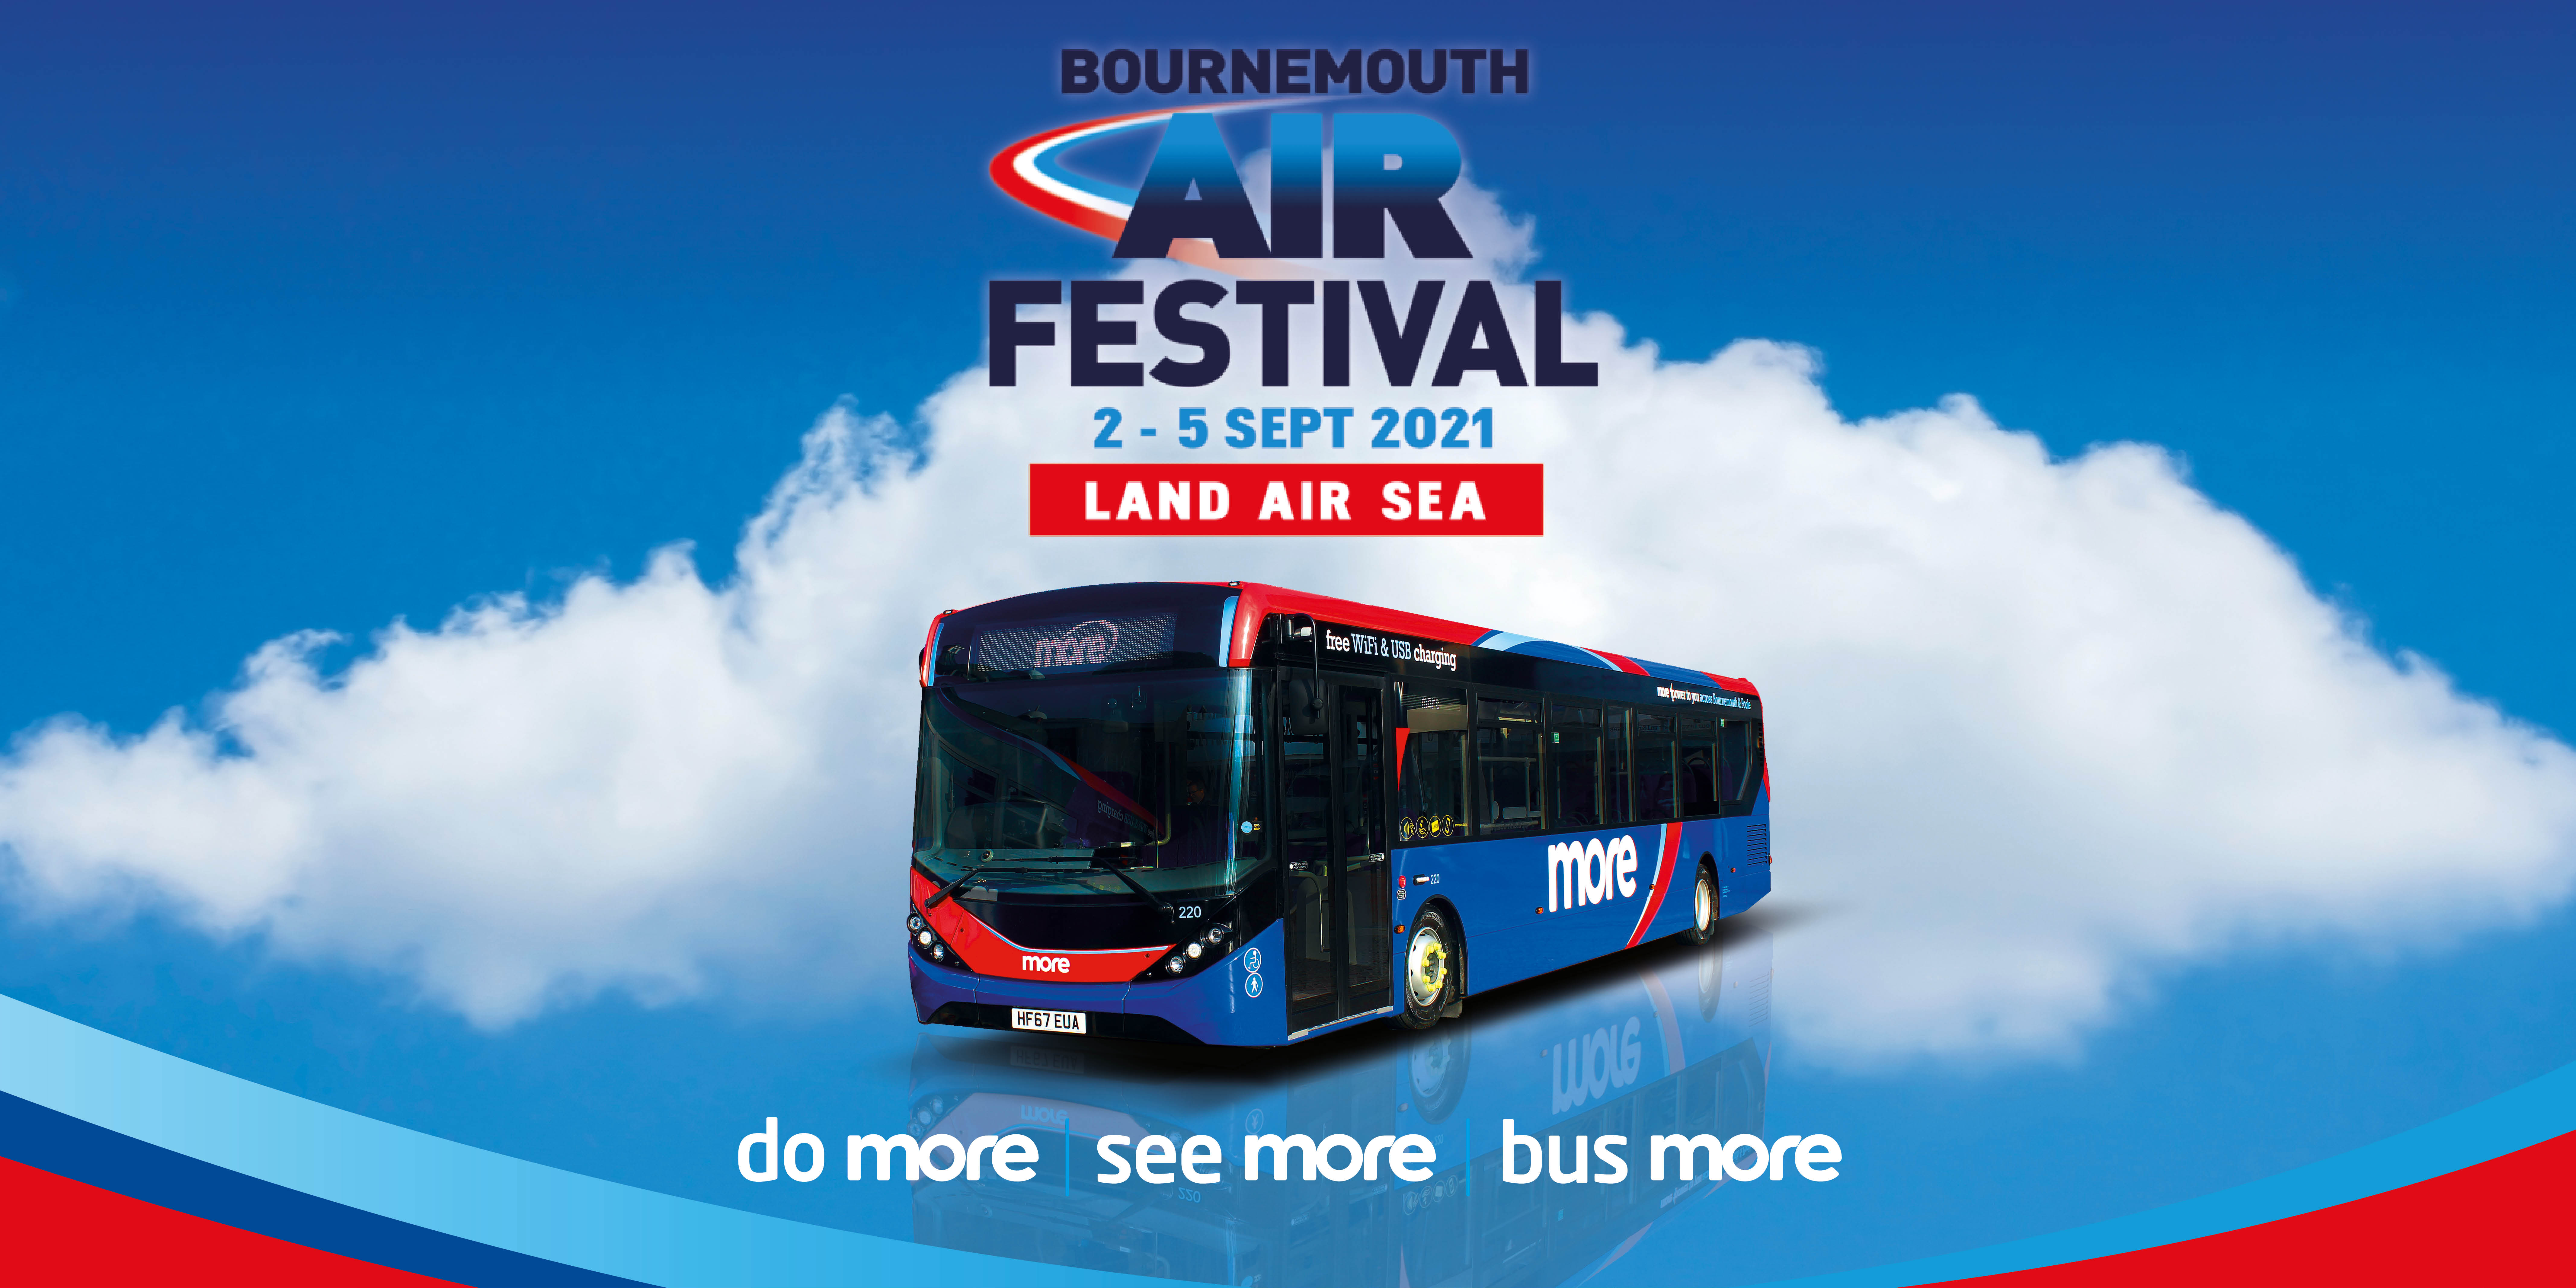 bournemouth air festival 2nd september to 5th september 2021